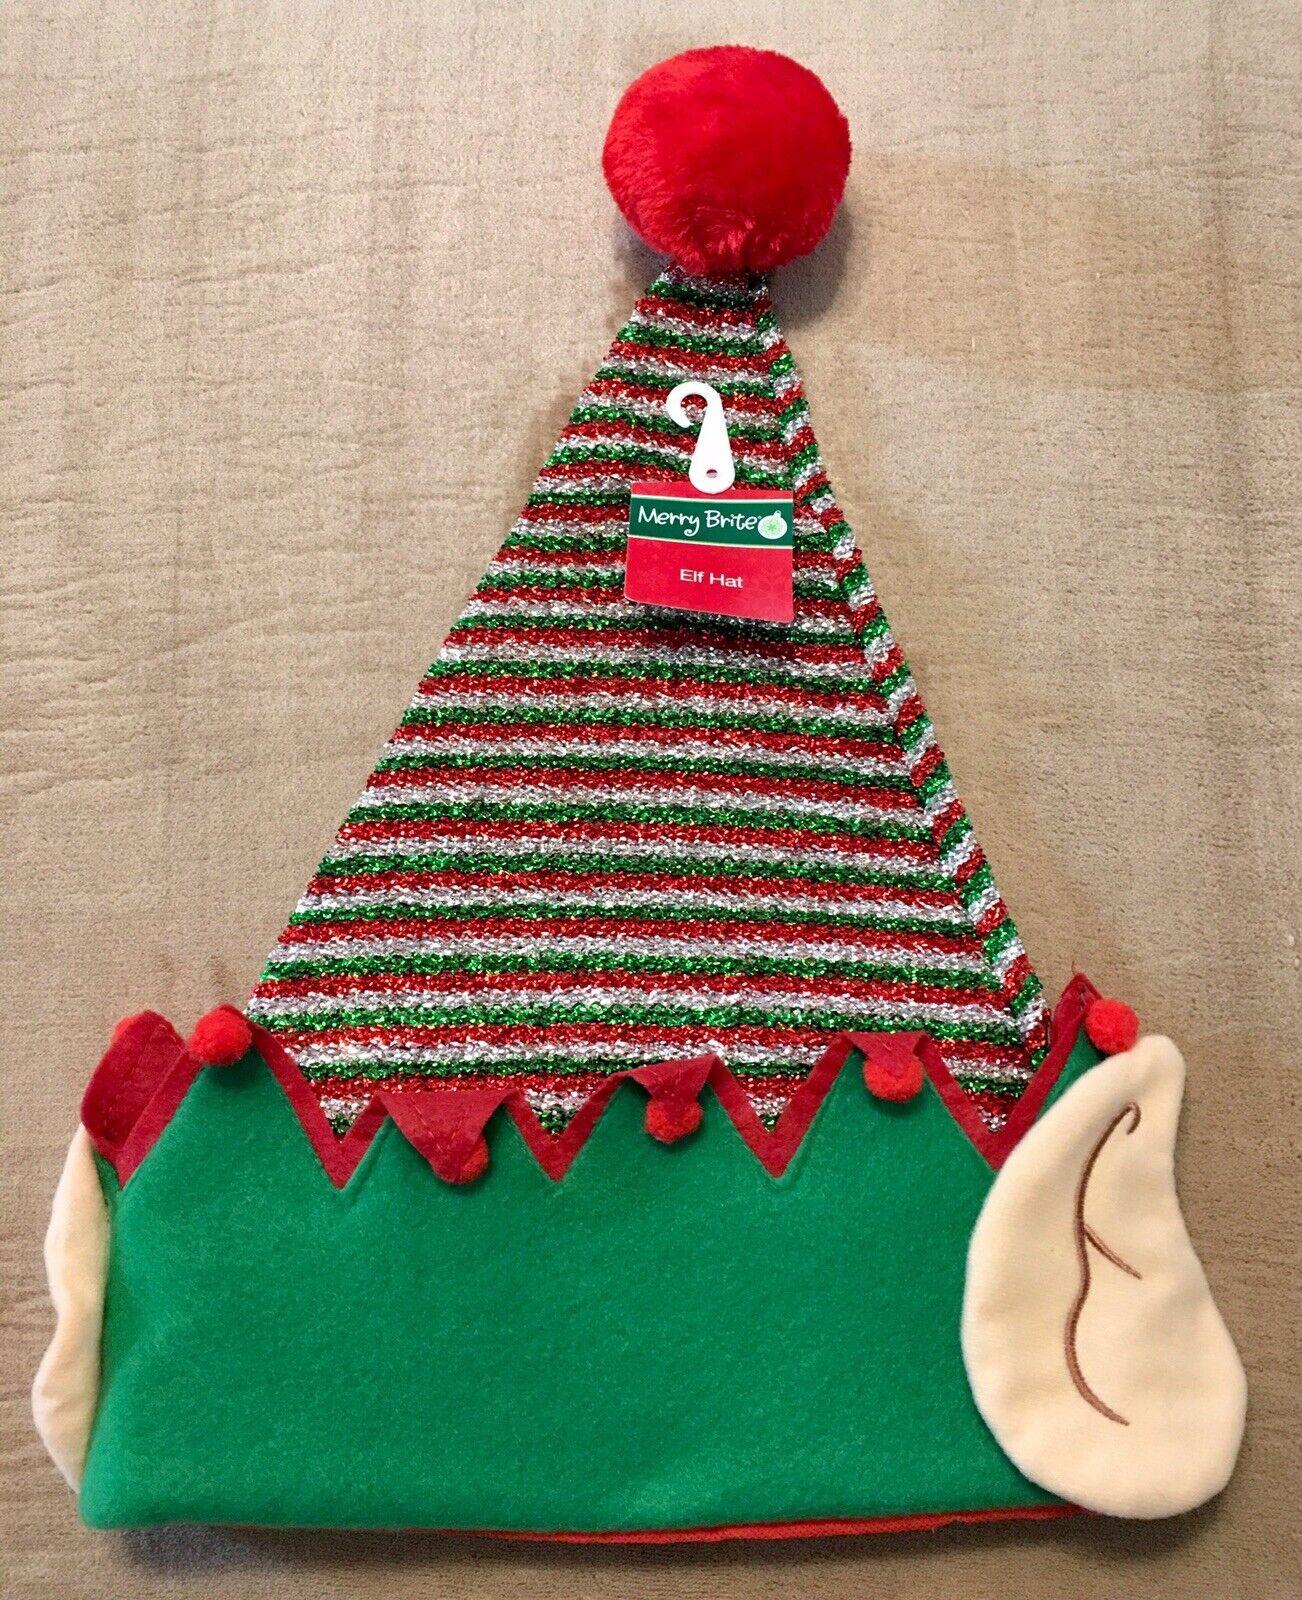 Santa Helper Elf Headband with Ears OSFM NWT